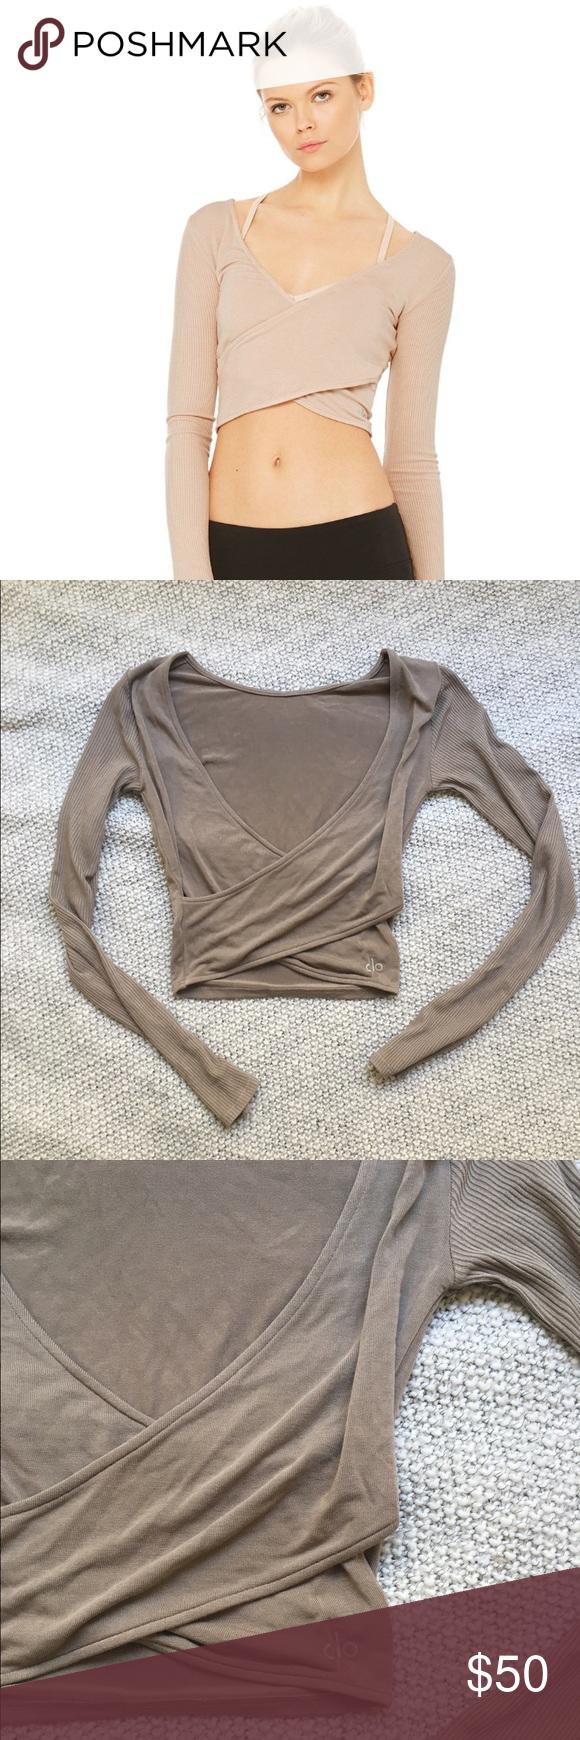 1534fe2a48a07 Alo yoga Amelia long sleeve Crop Never been worn. Gravel Amelia long sleeve  top. ALO Yoga Tops Crop Tops